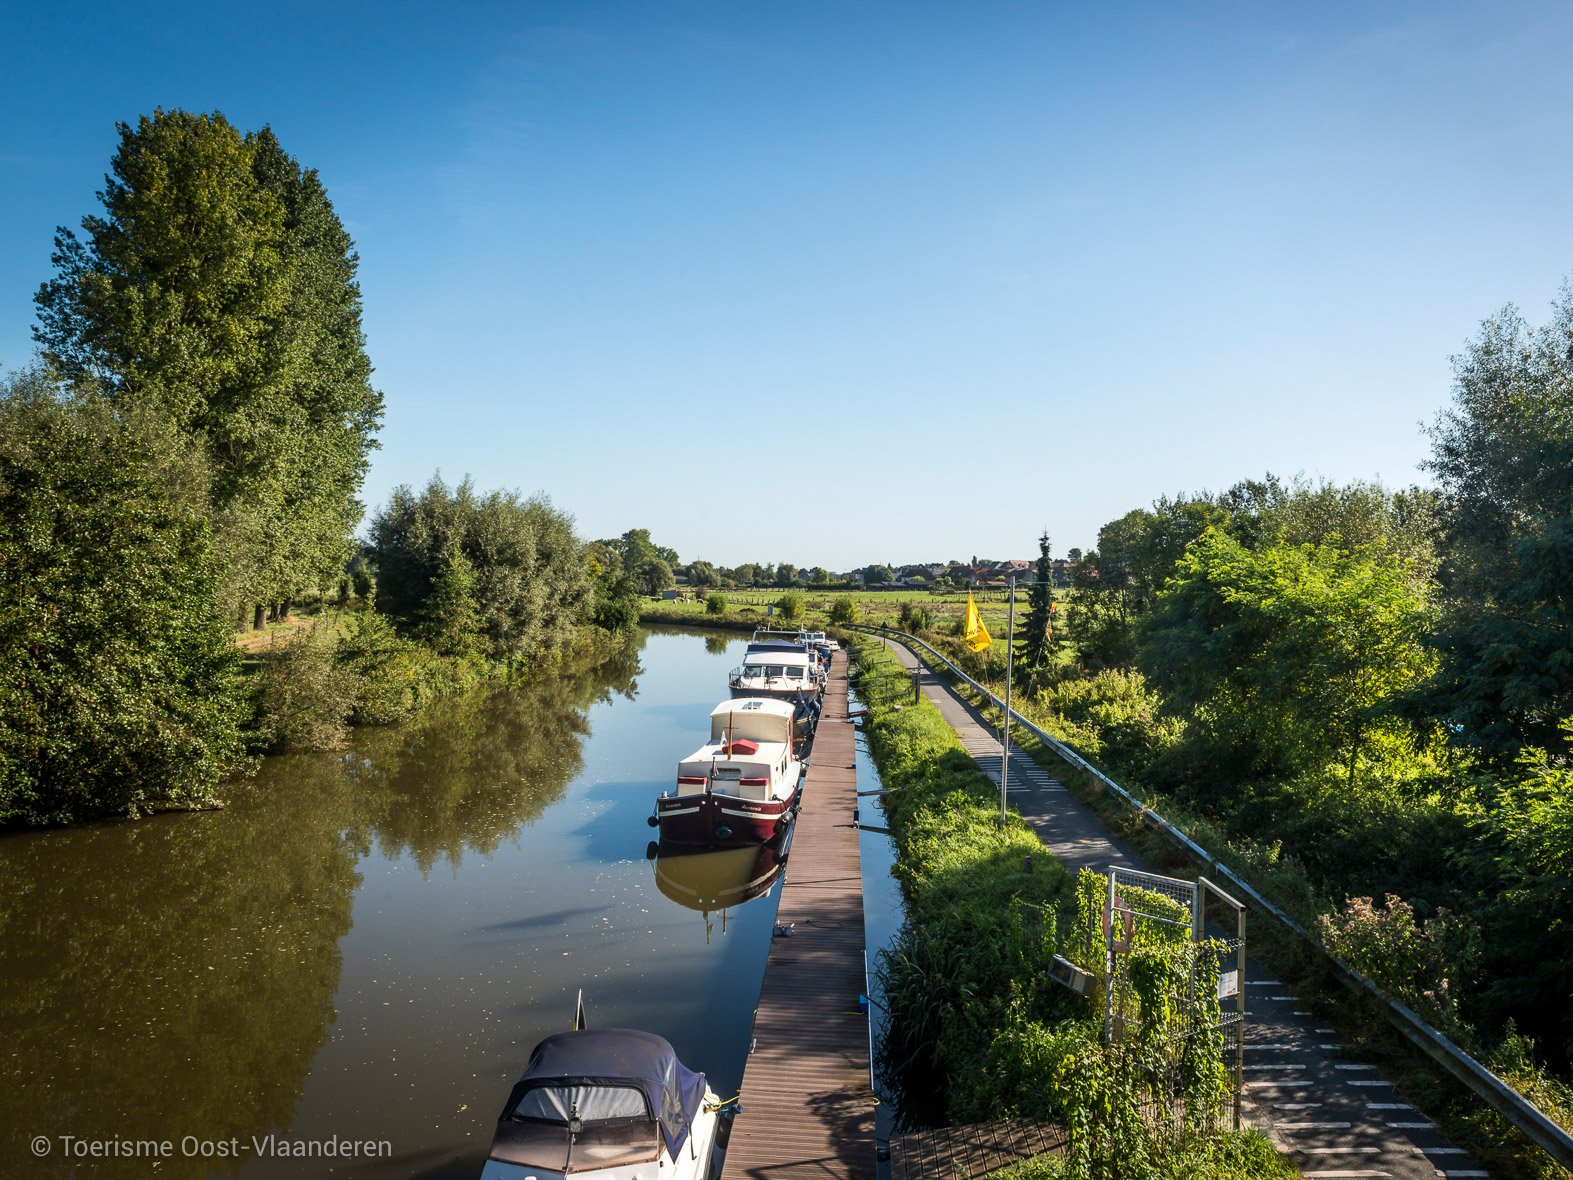 Development of the Strategic Plan 'Room for Water: Dender Valley'